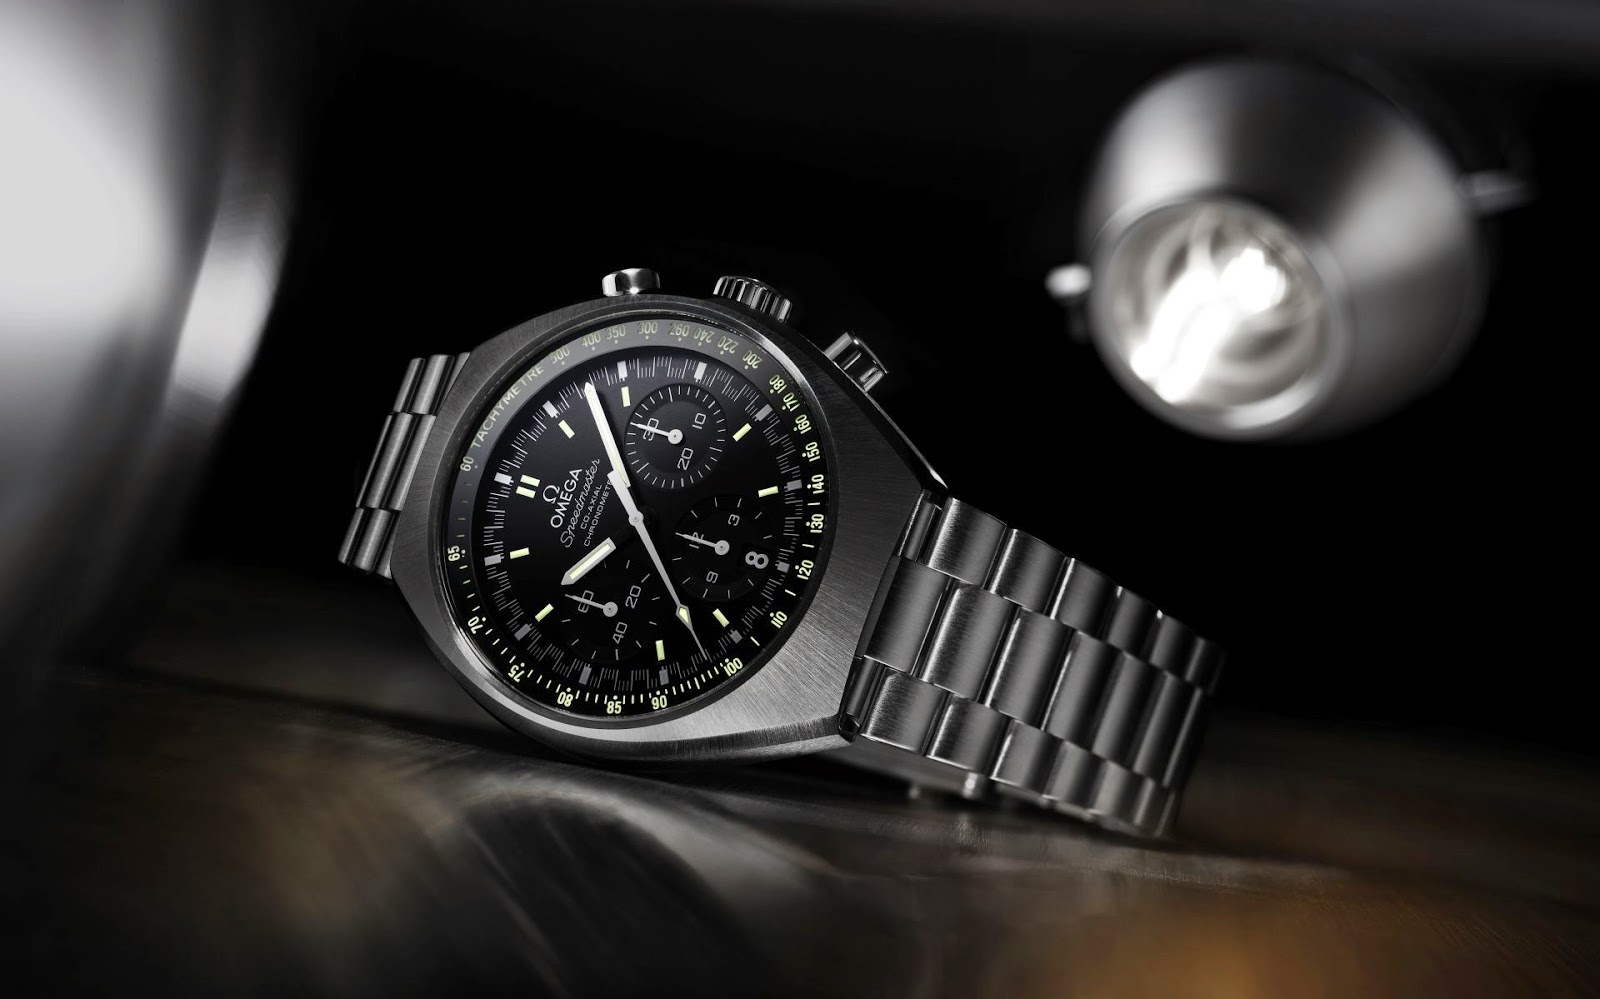 Omega Speedmaster Mark II replica watch